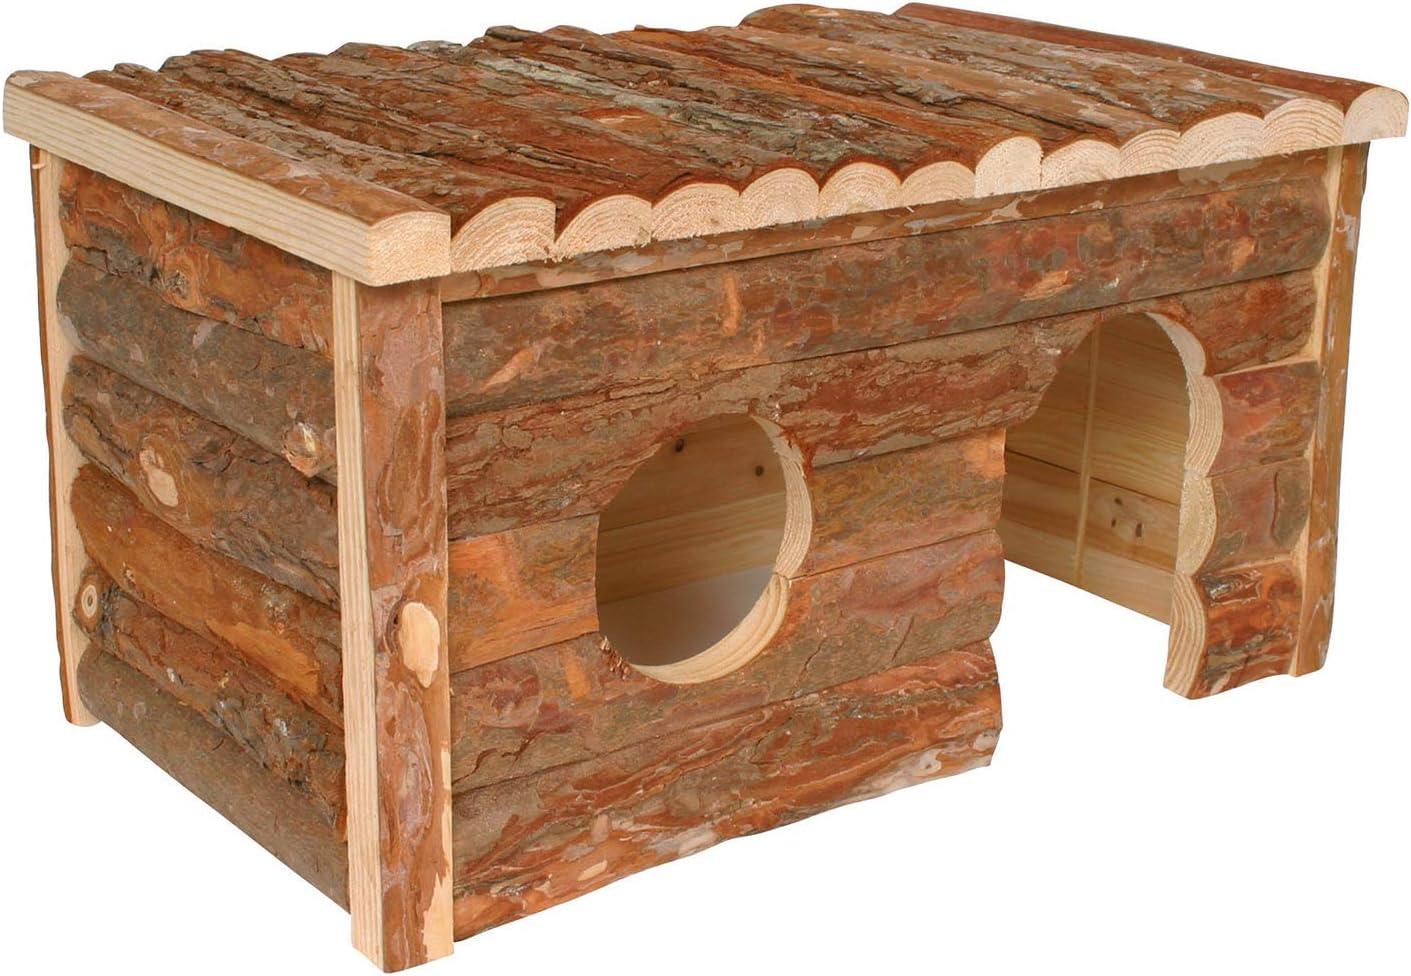 Arquivet 8435117862357 - Casa roedores Grande 40 x 23 x 20 cm